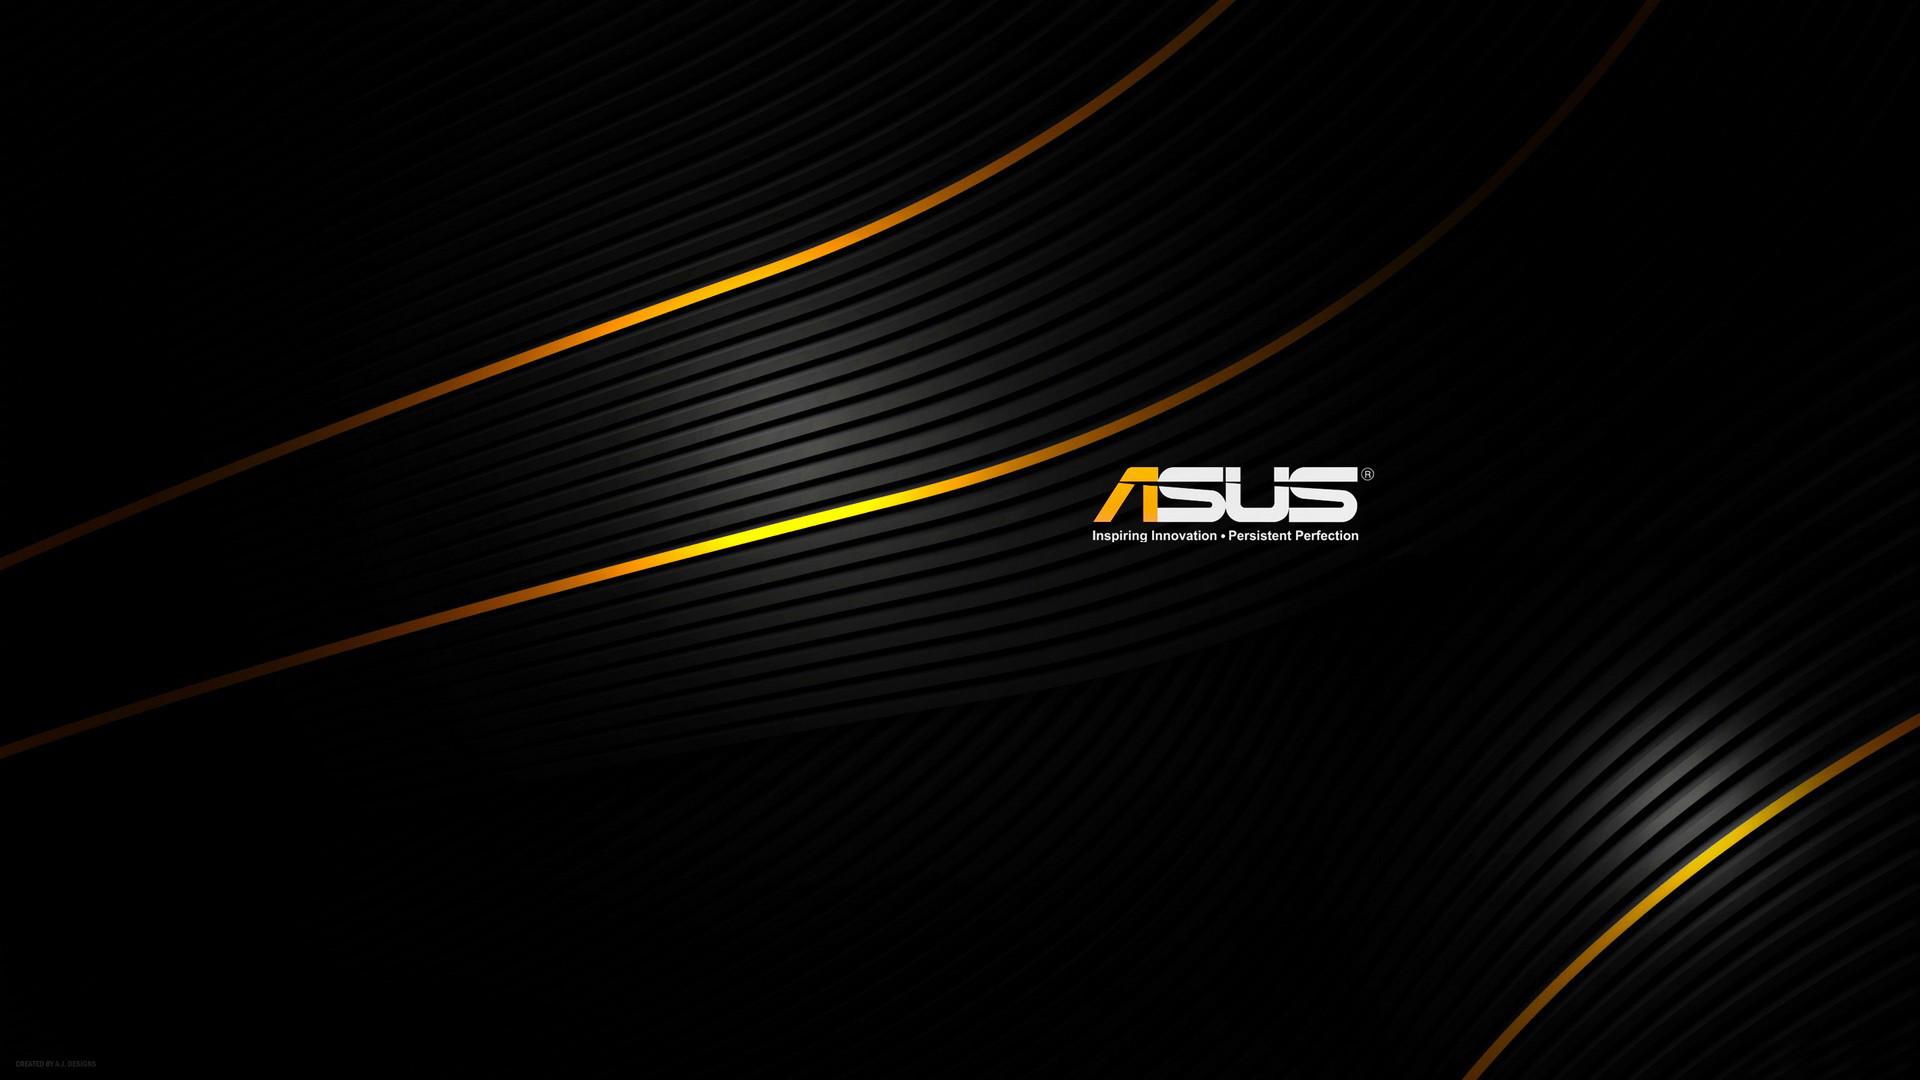 … ASUS Games Logo Orange Lines On Black Background HD wallpaper for free